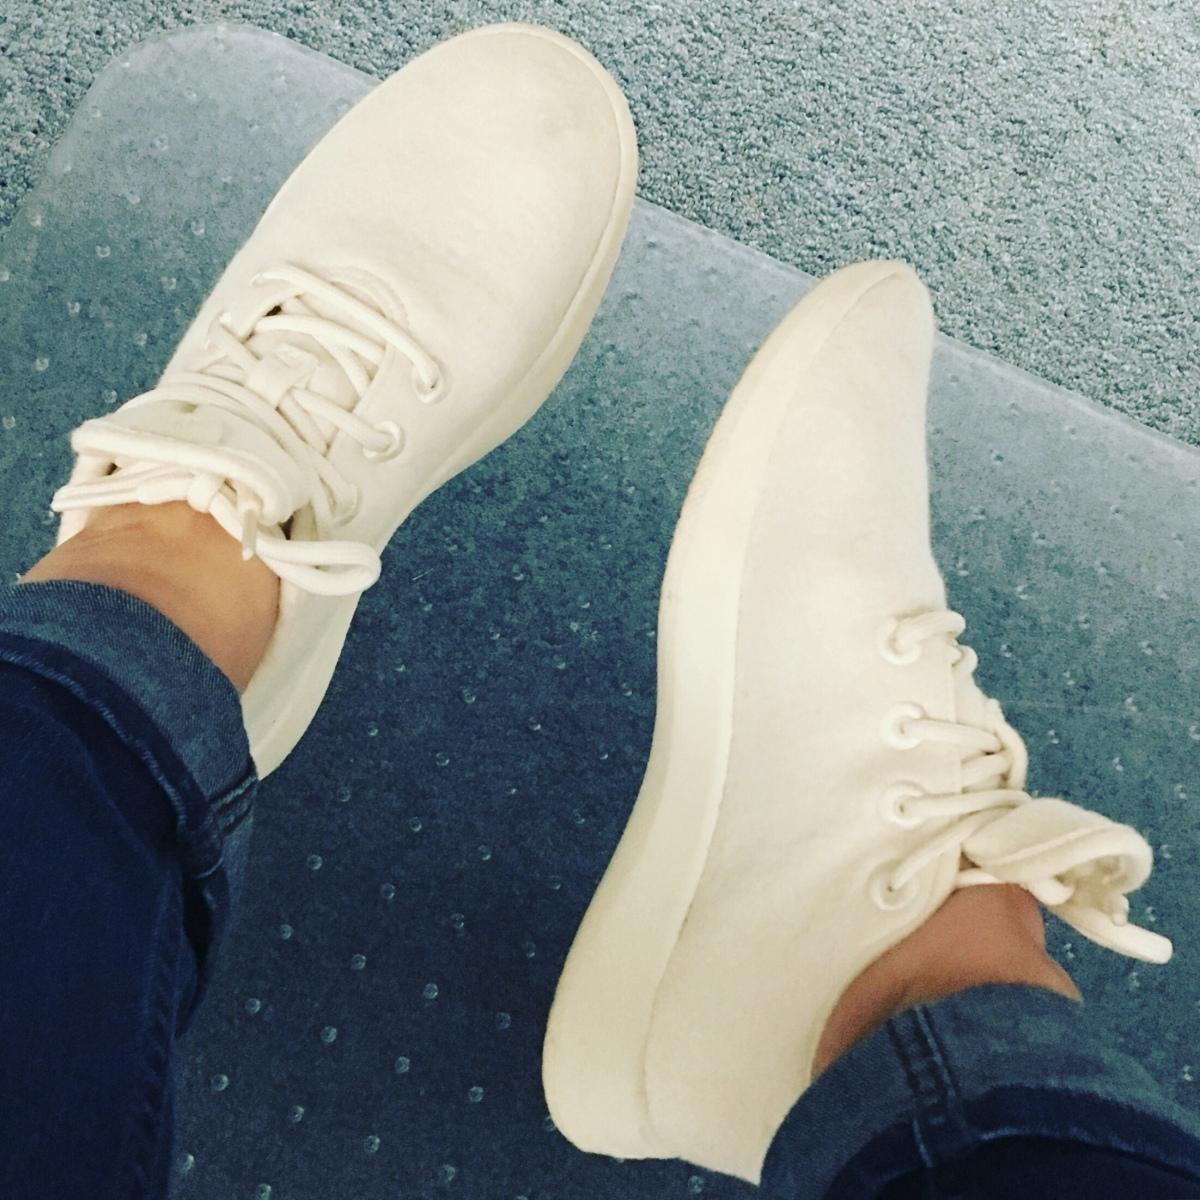 White AllBirds Wool Sneakers review samanthawan.com.au